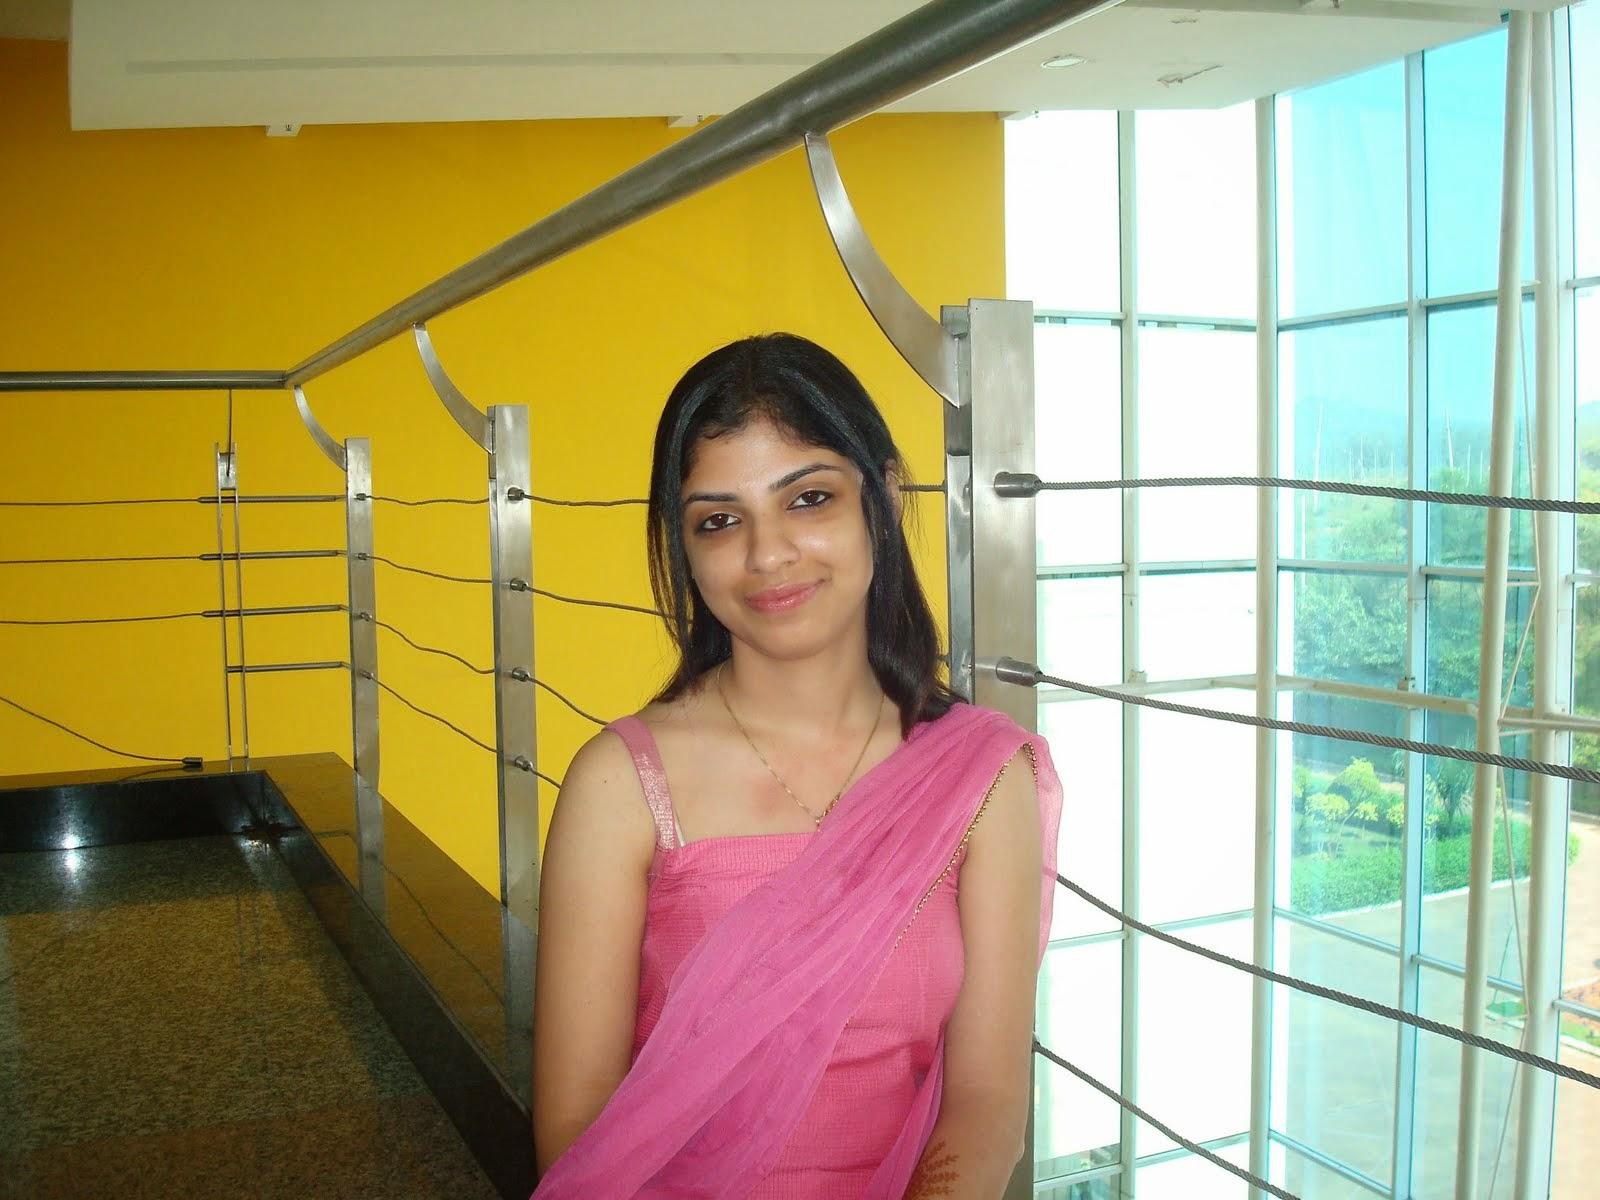 Desi bhabhi sexy image-8817